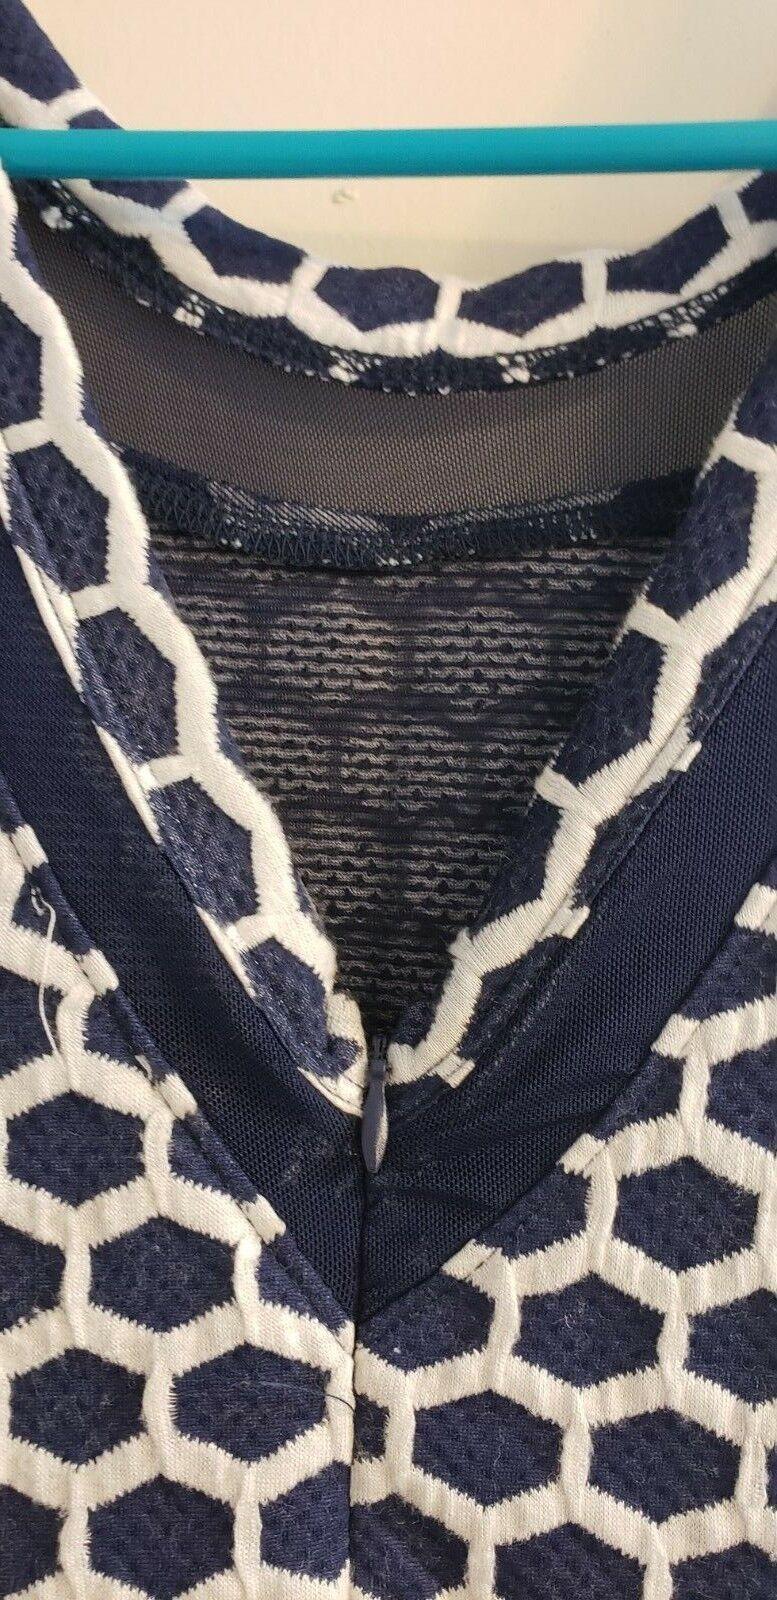 Pixley Millie  textured knit dress - image 2